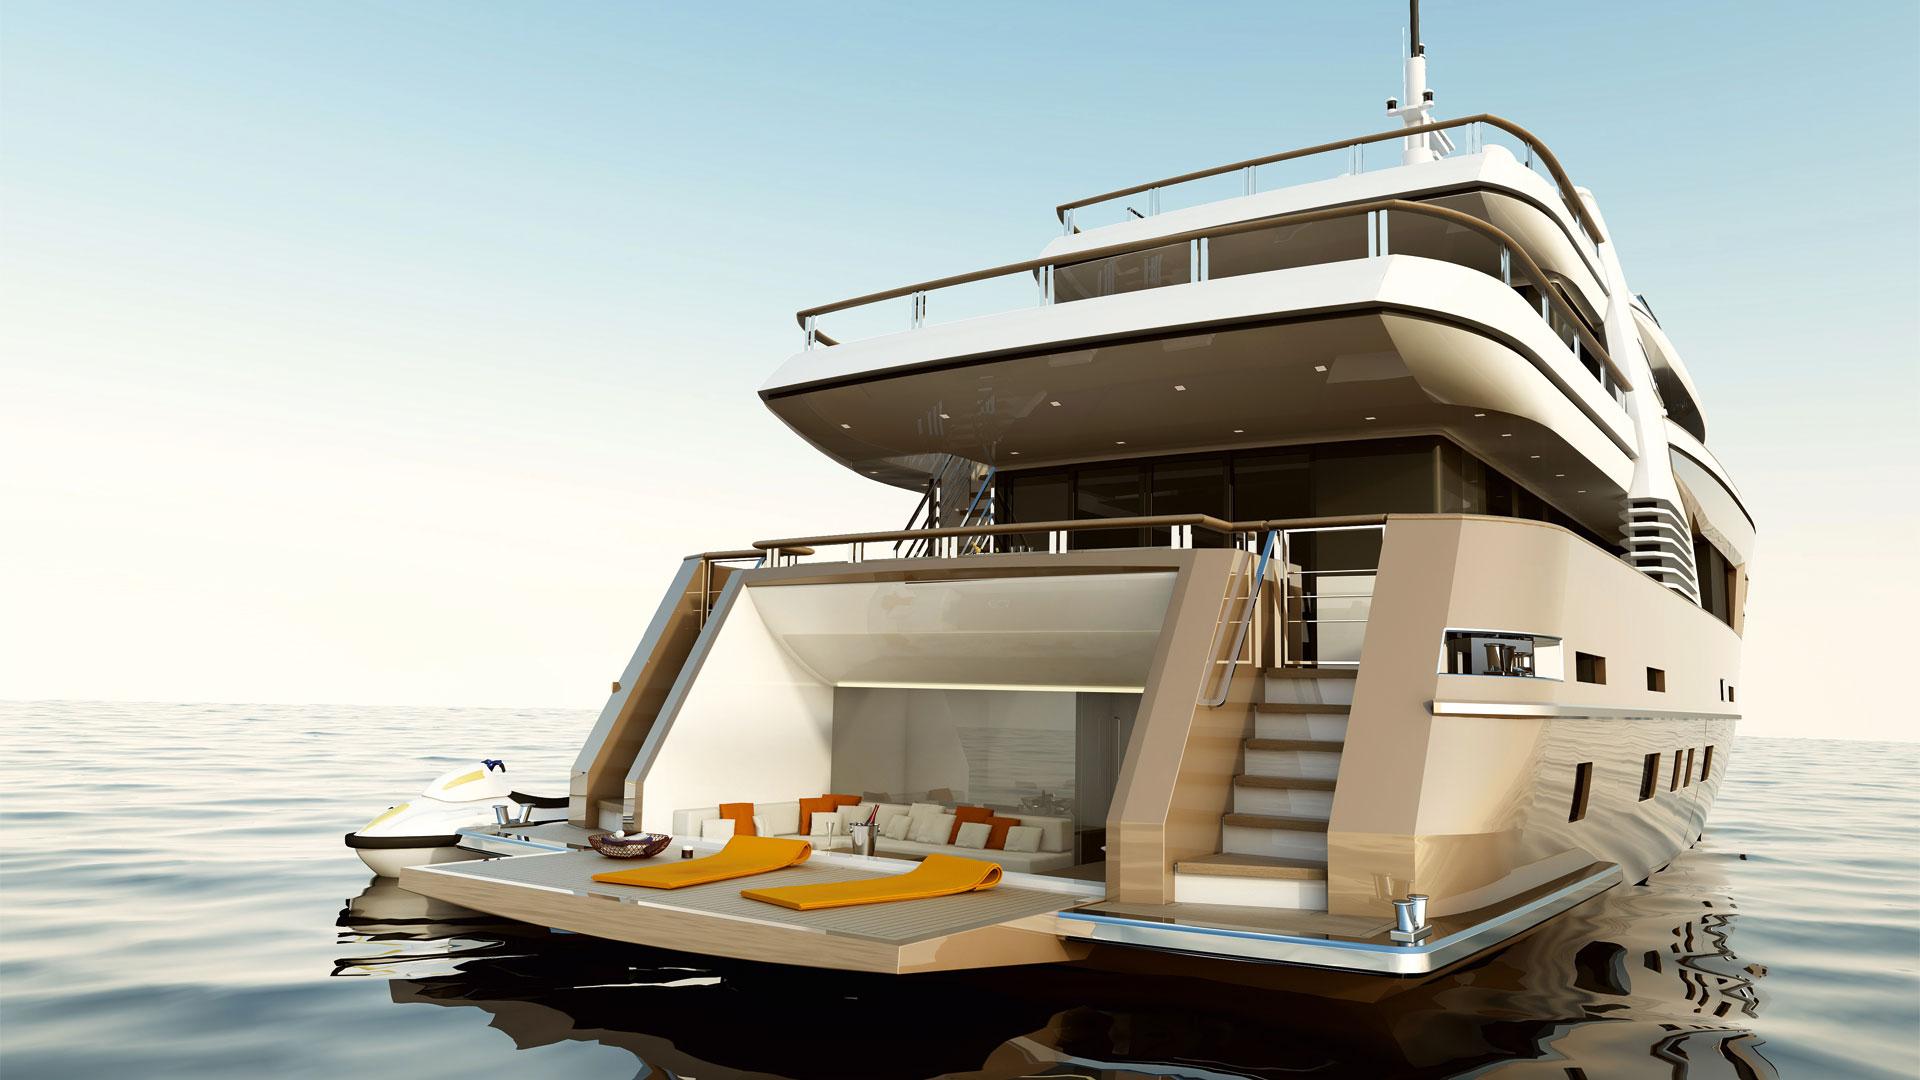 Concept of Bandido Yachts -  - Drettmann Yachts